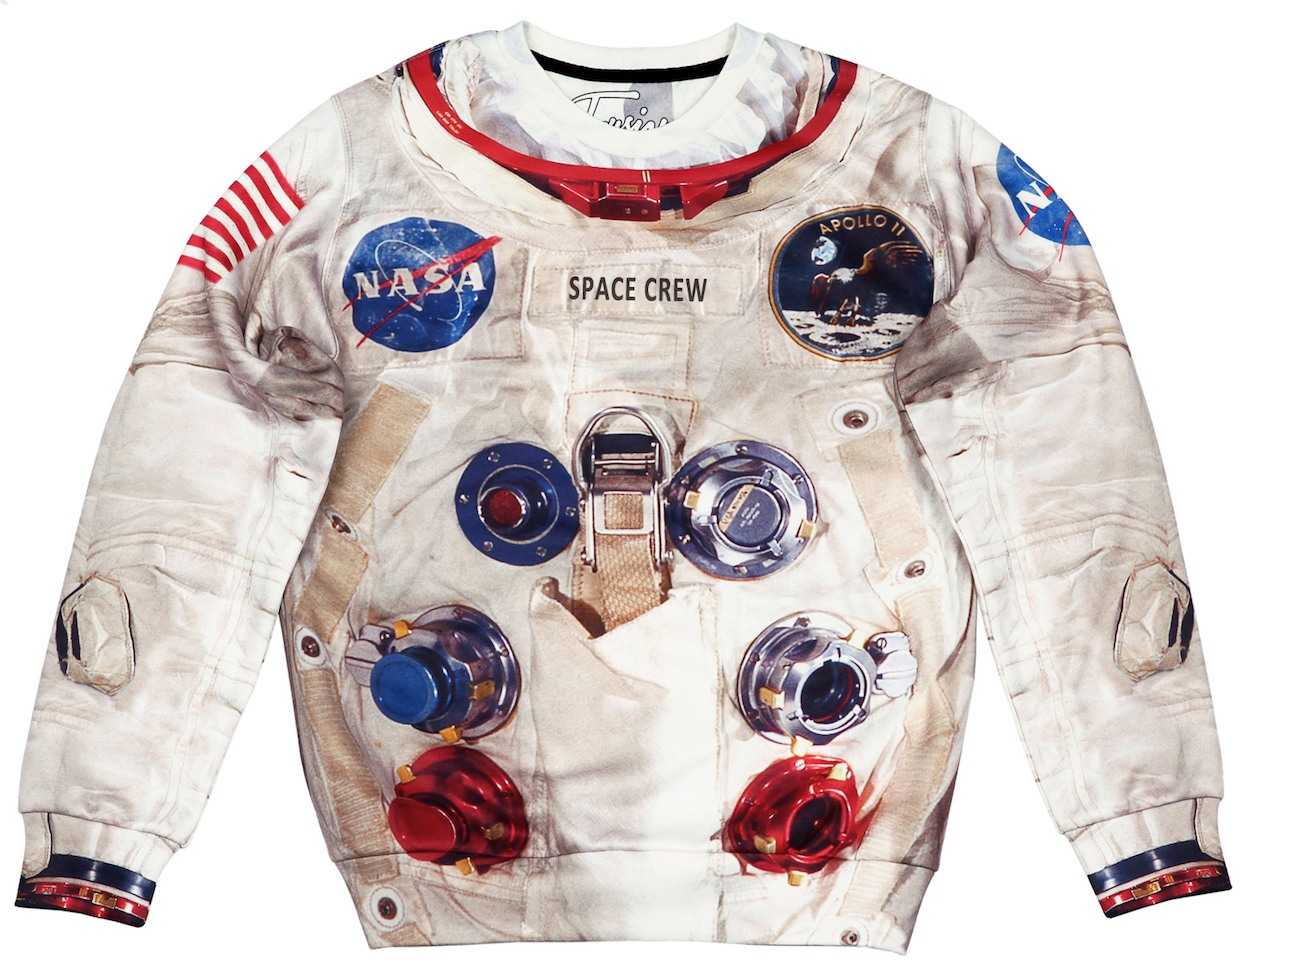 Apollo 11 Printed Sweatsuit by Fusion